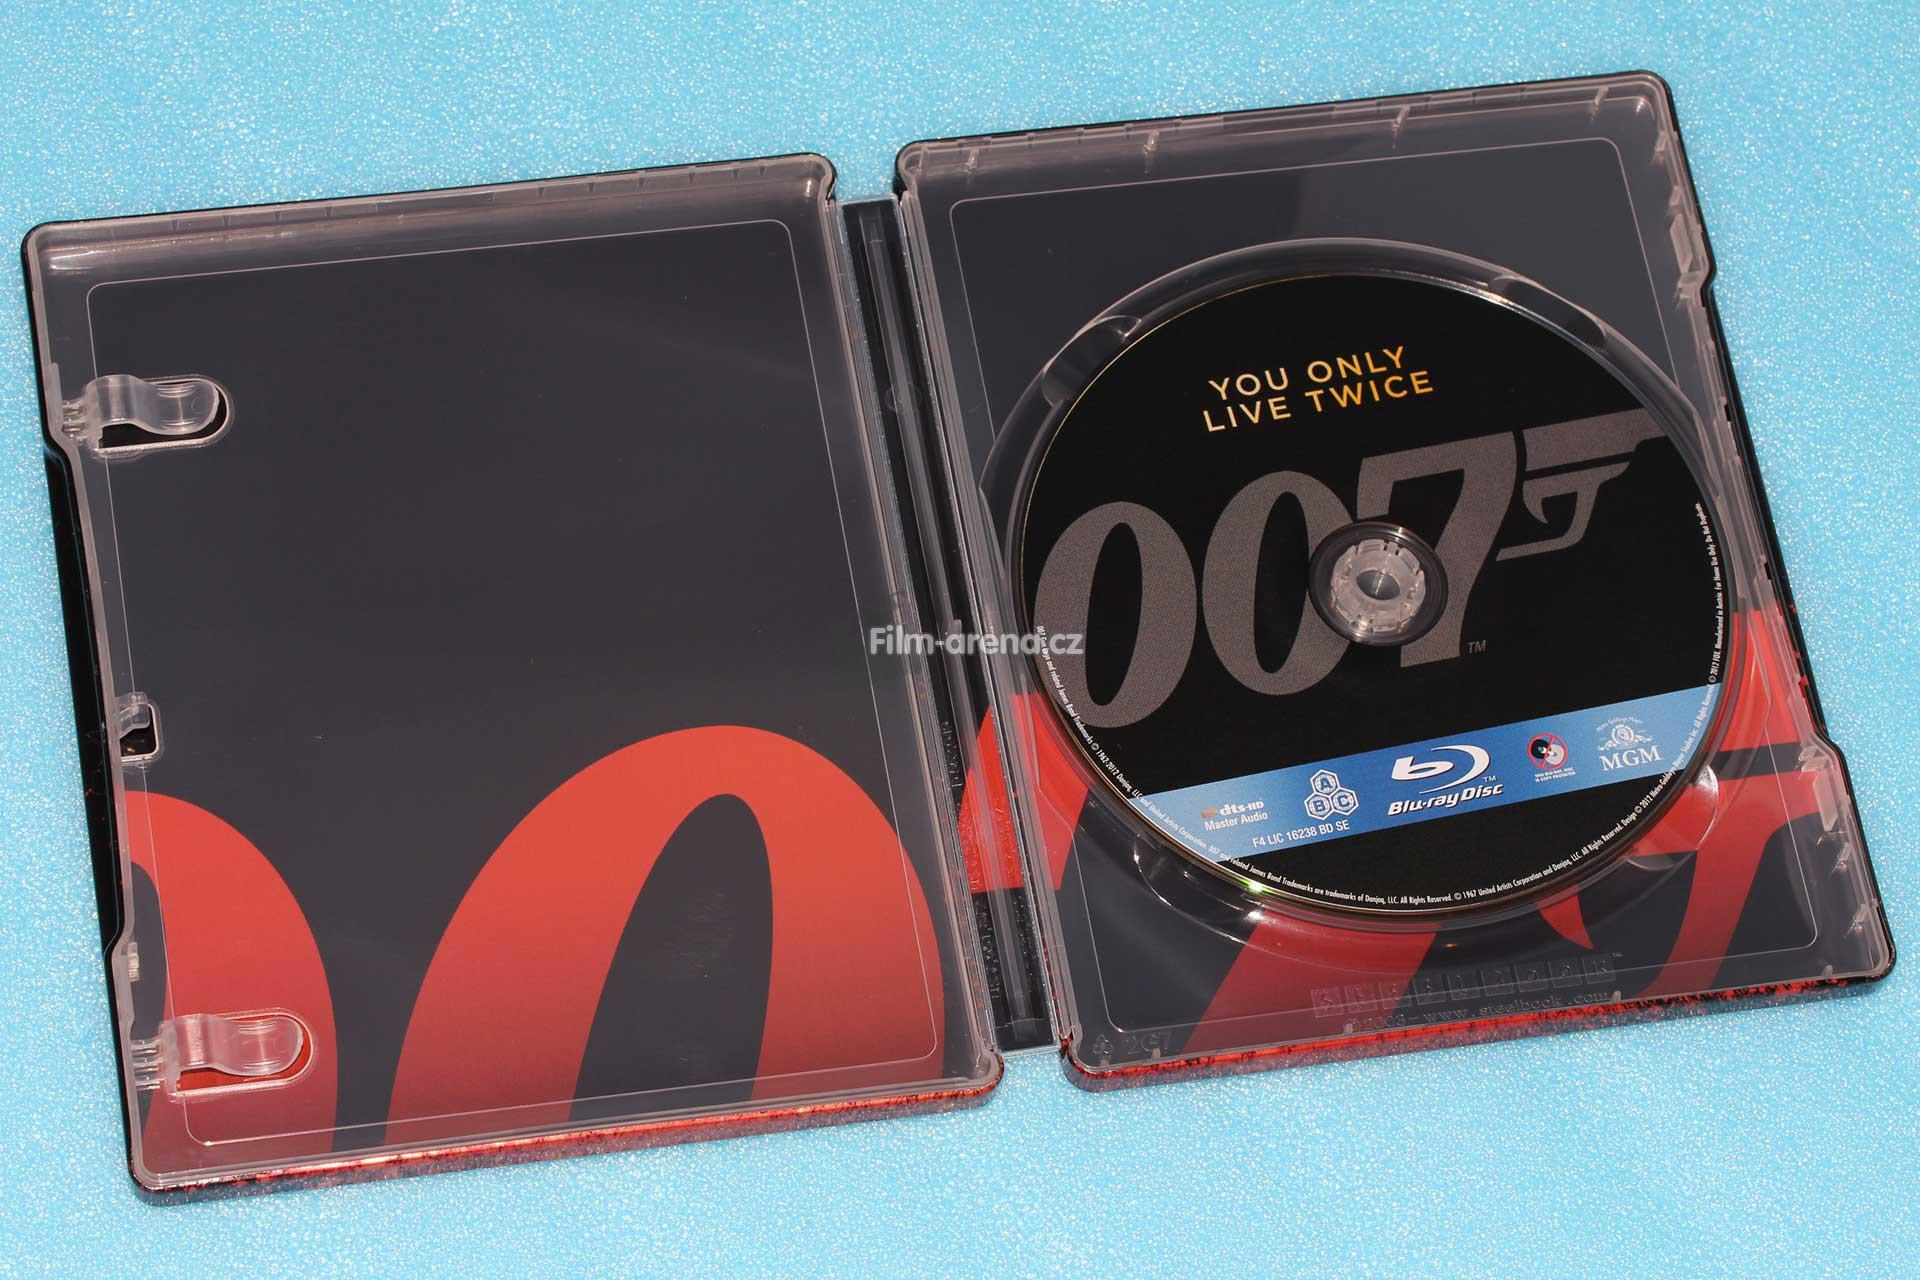 http://www.filmarena.cz/upload/images/nazivo/James_Bond/1967_Zijes_jenom_dvakrat/1967_zijes_04.jpg